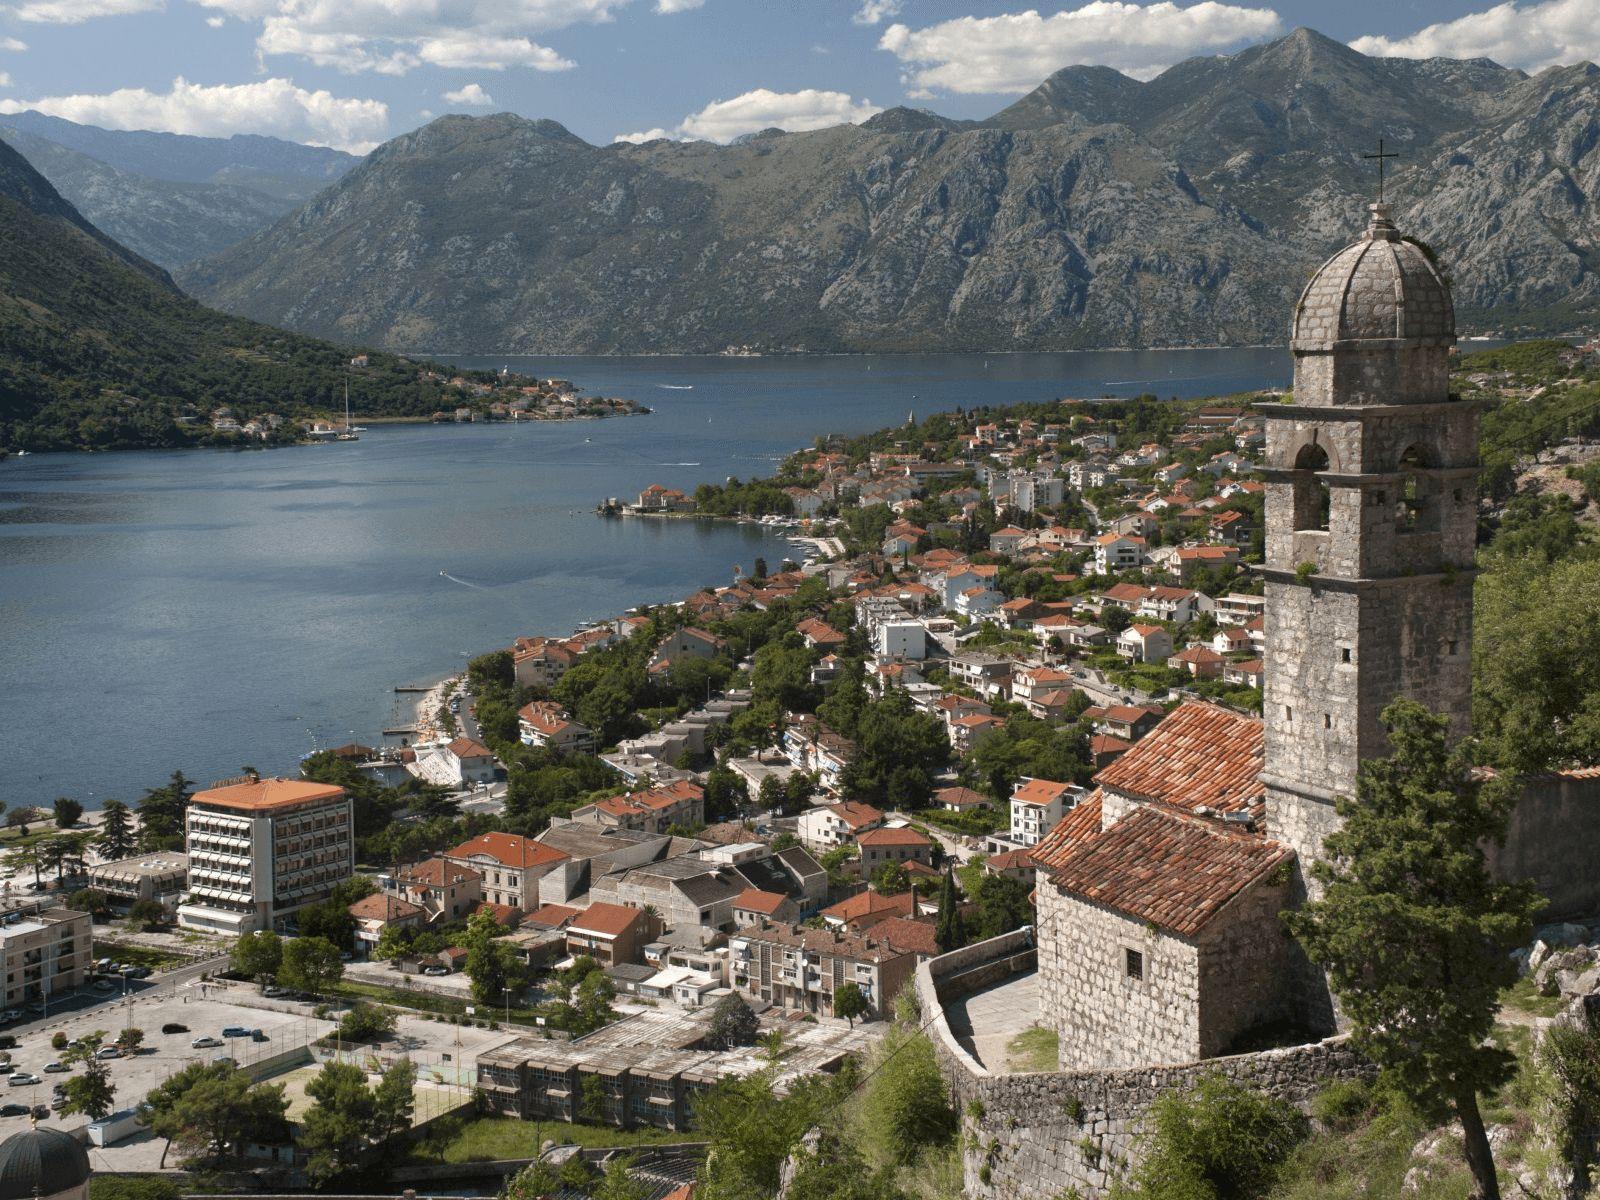 Budva i Crna Gora: Kotor i Boka Kotorska